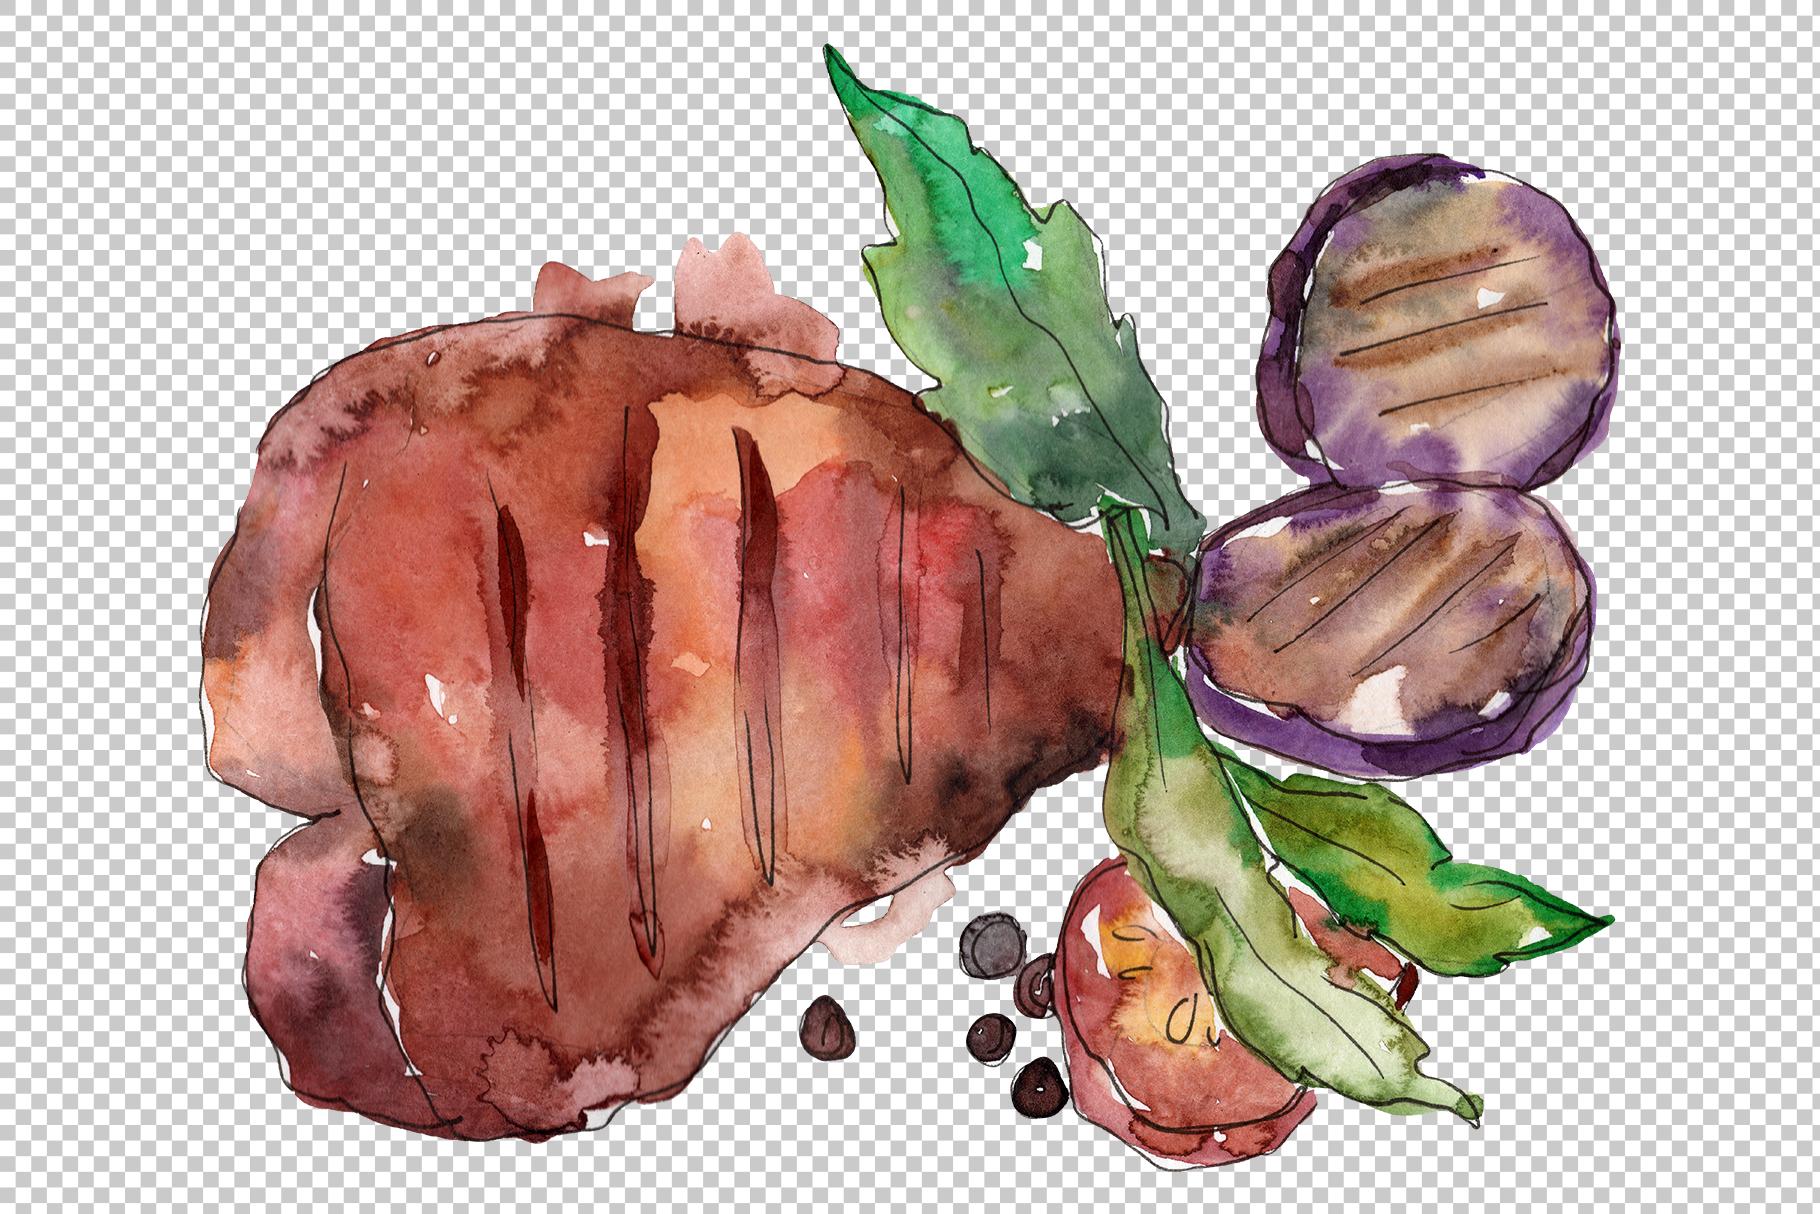 Steak Watercolor png example image 8